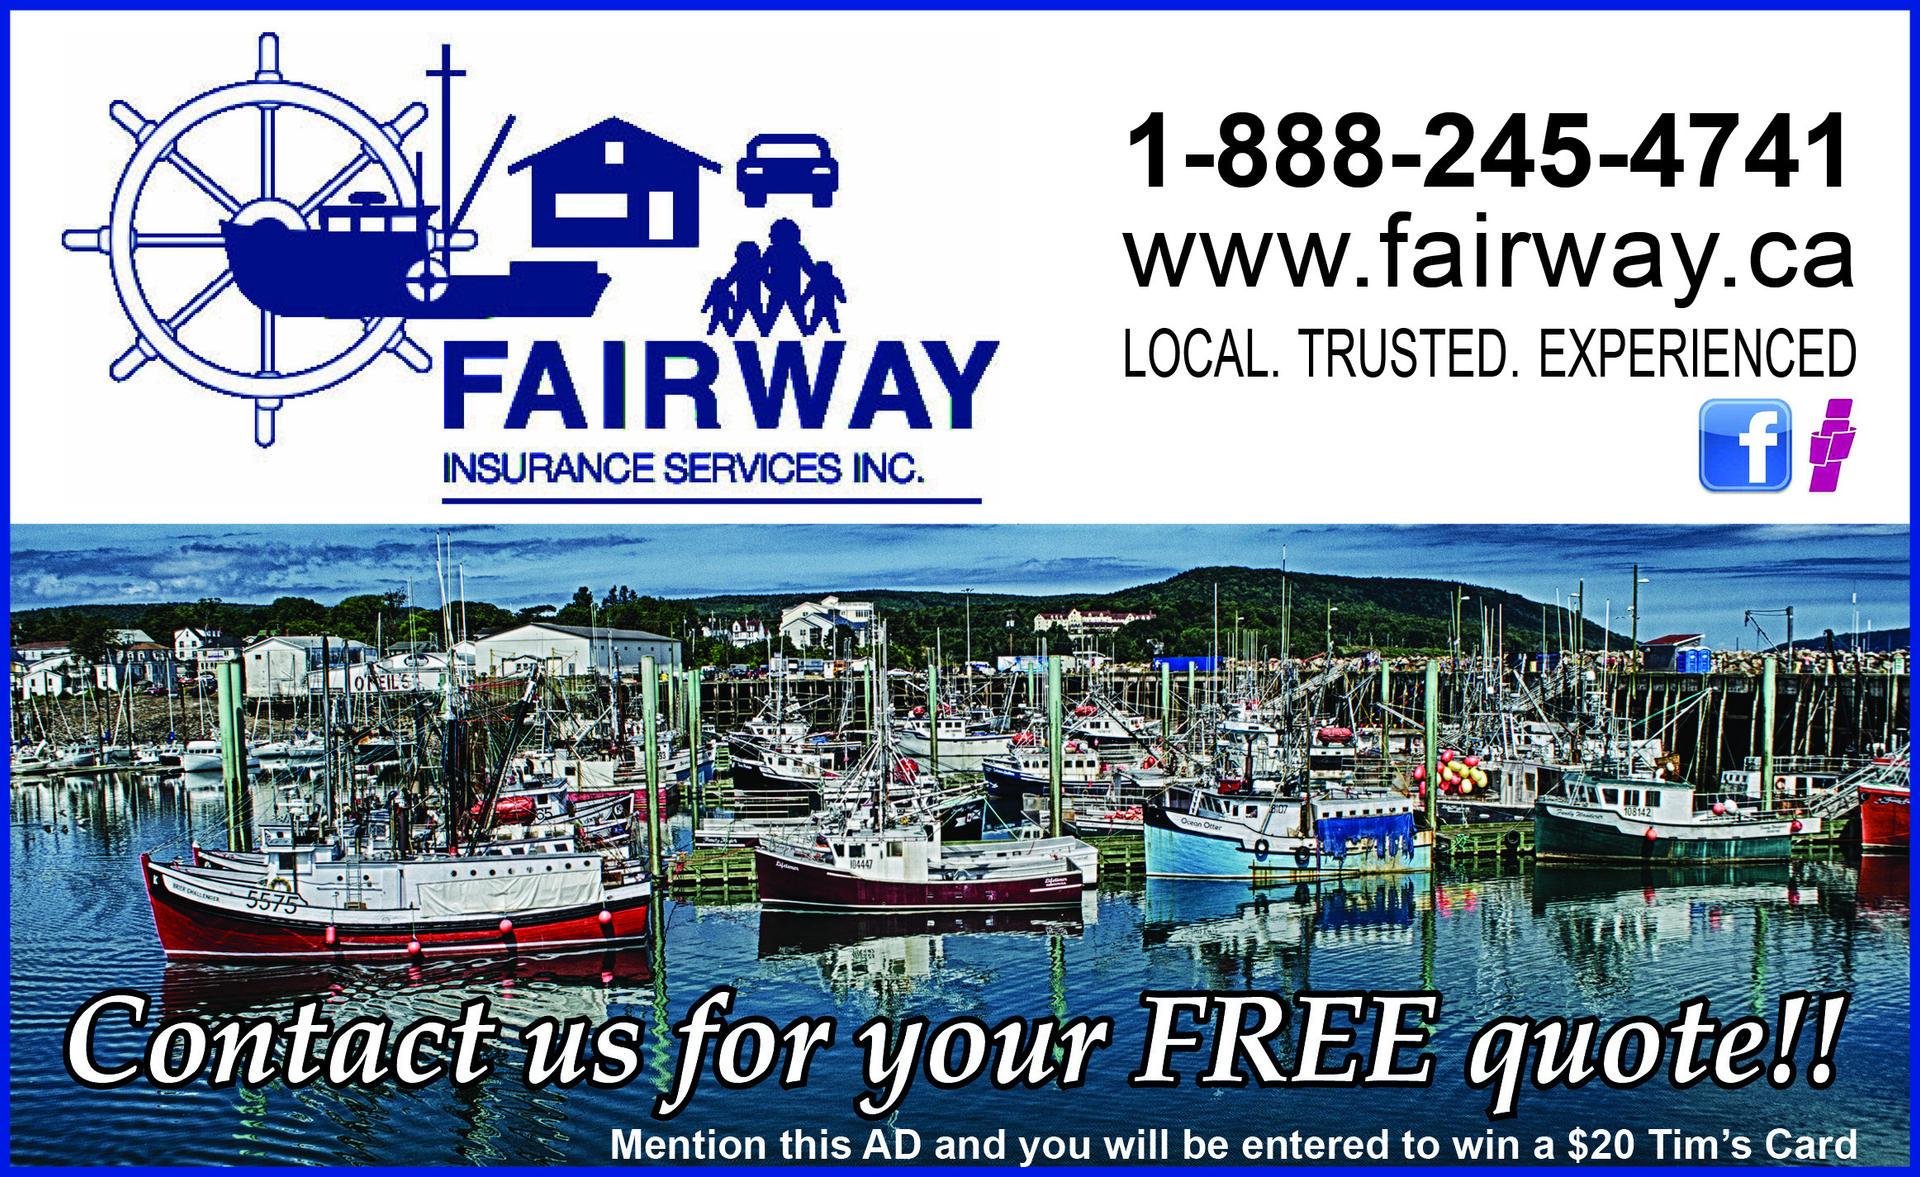 Fairway Insurance